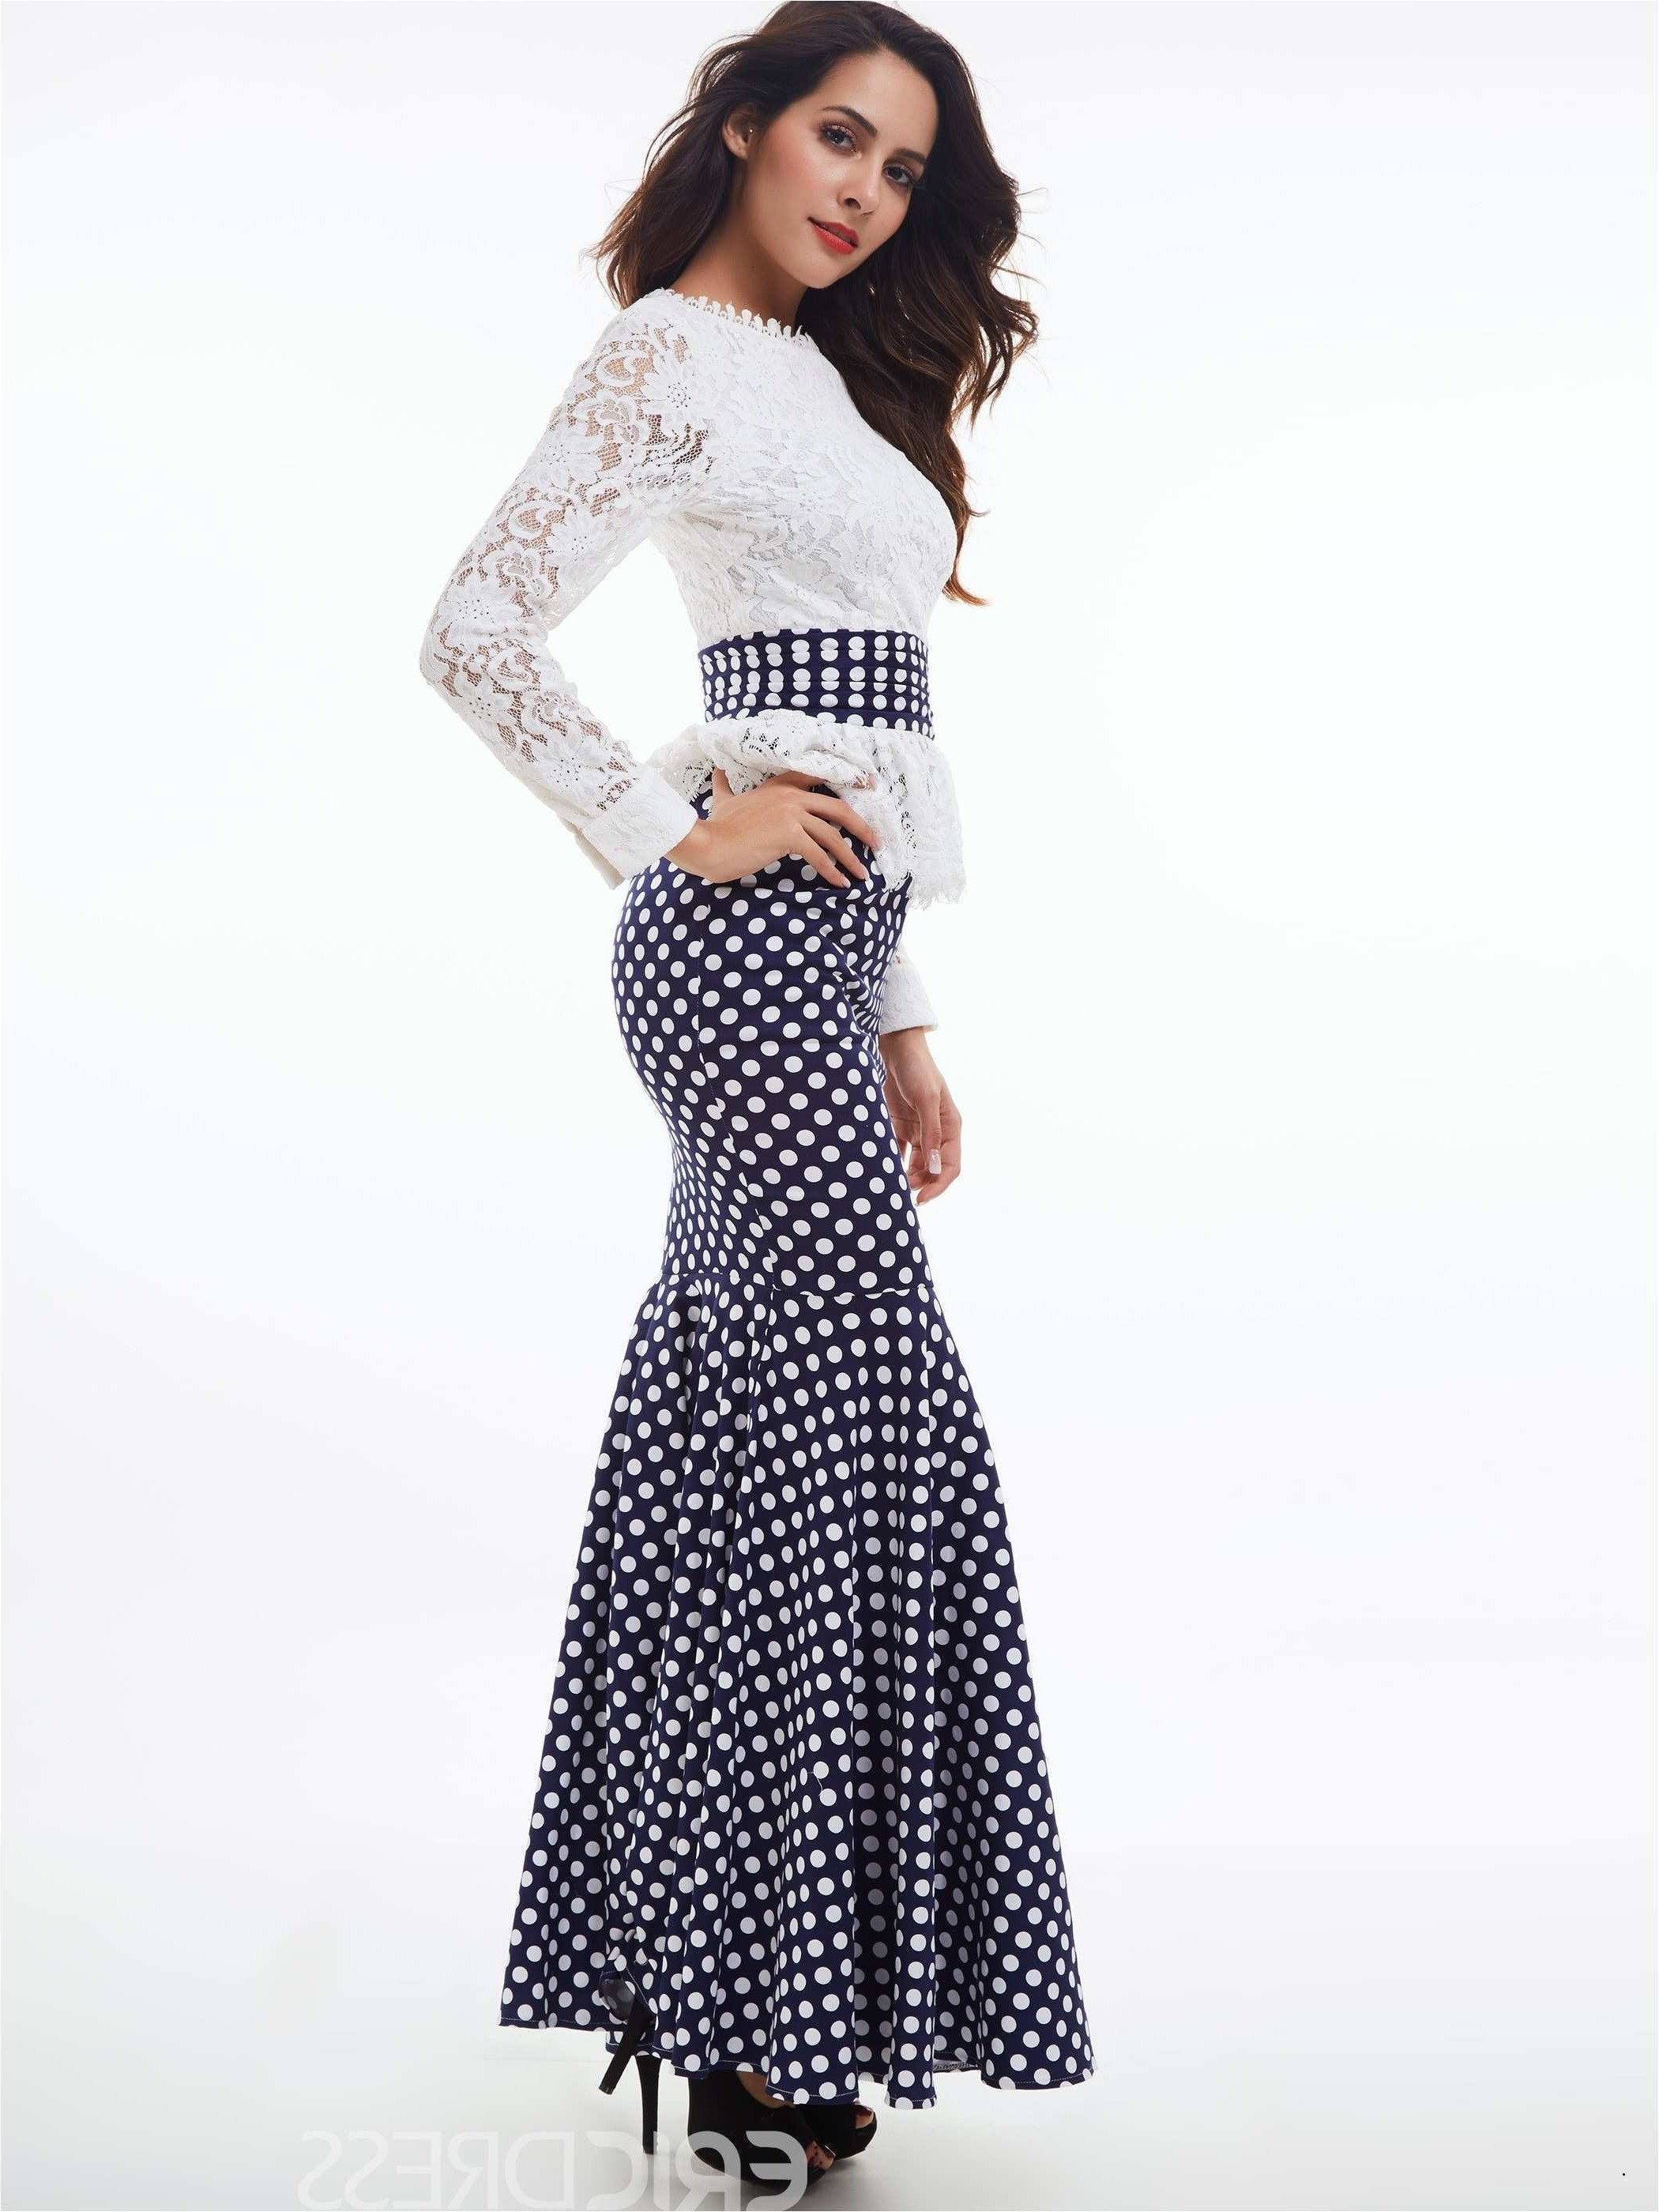 Design Foto Baju Pengantin India Muslim Gdd0 Ecehispanic